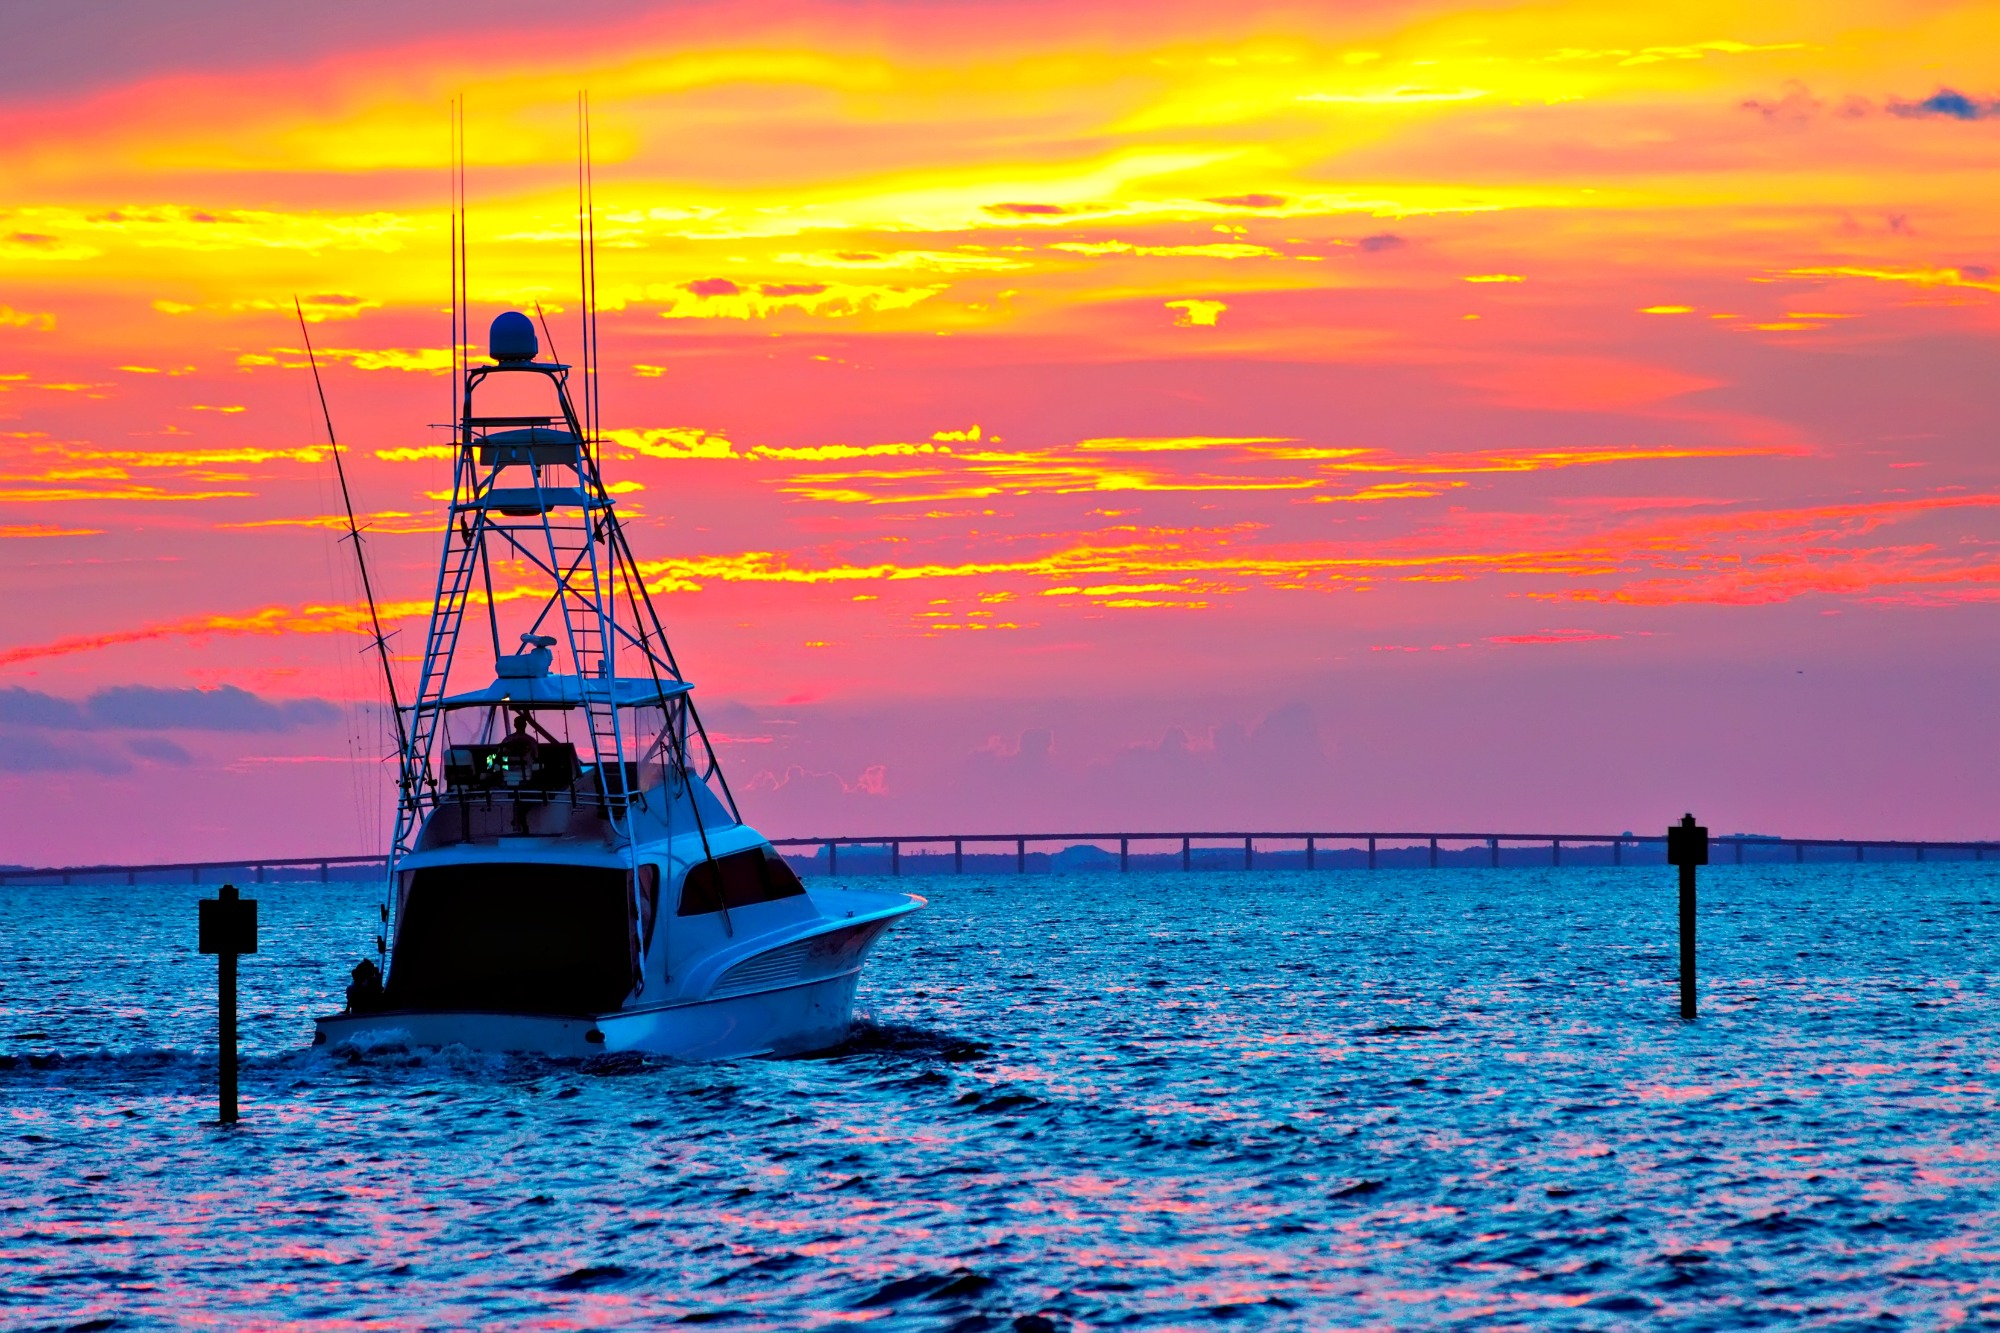 Fishing boat at sunset for Gulf Coast fishing blog